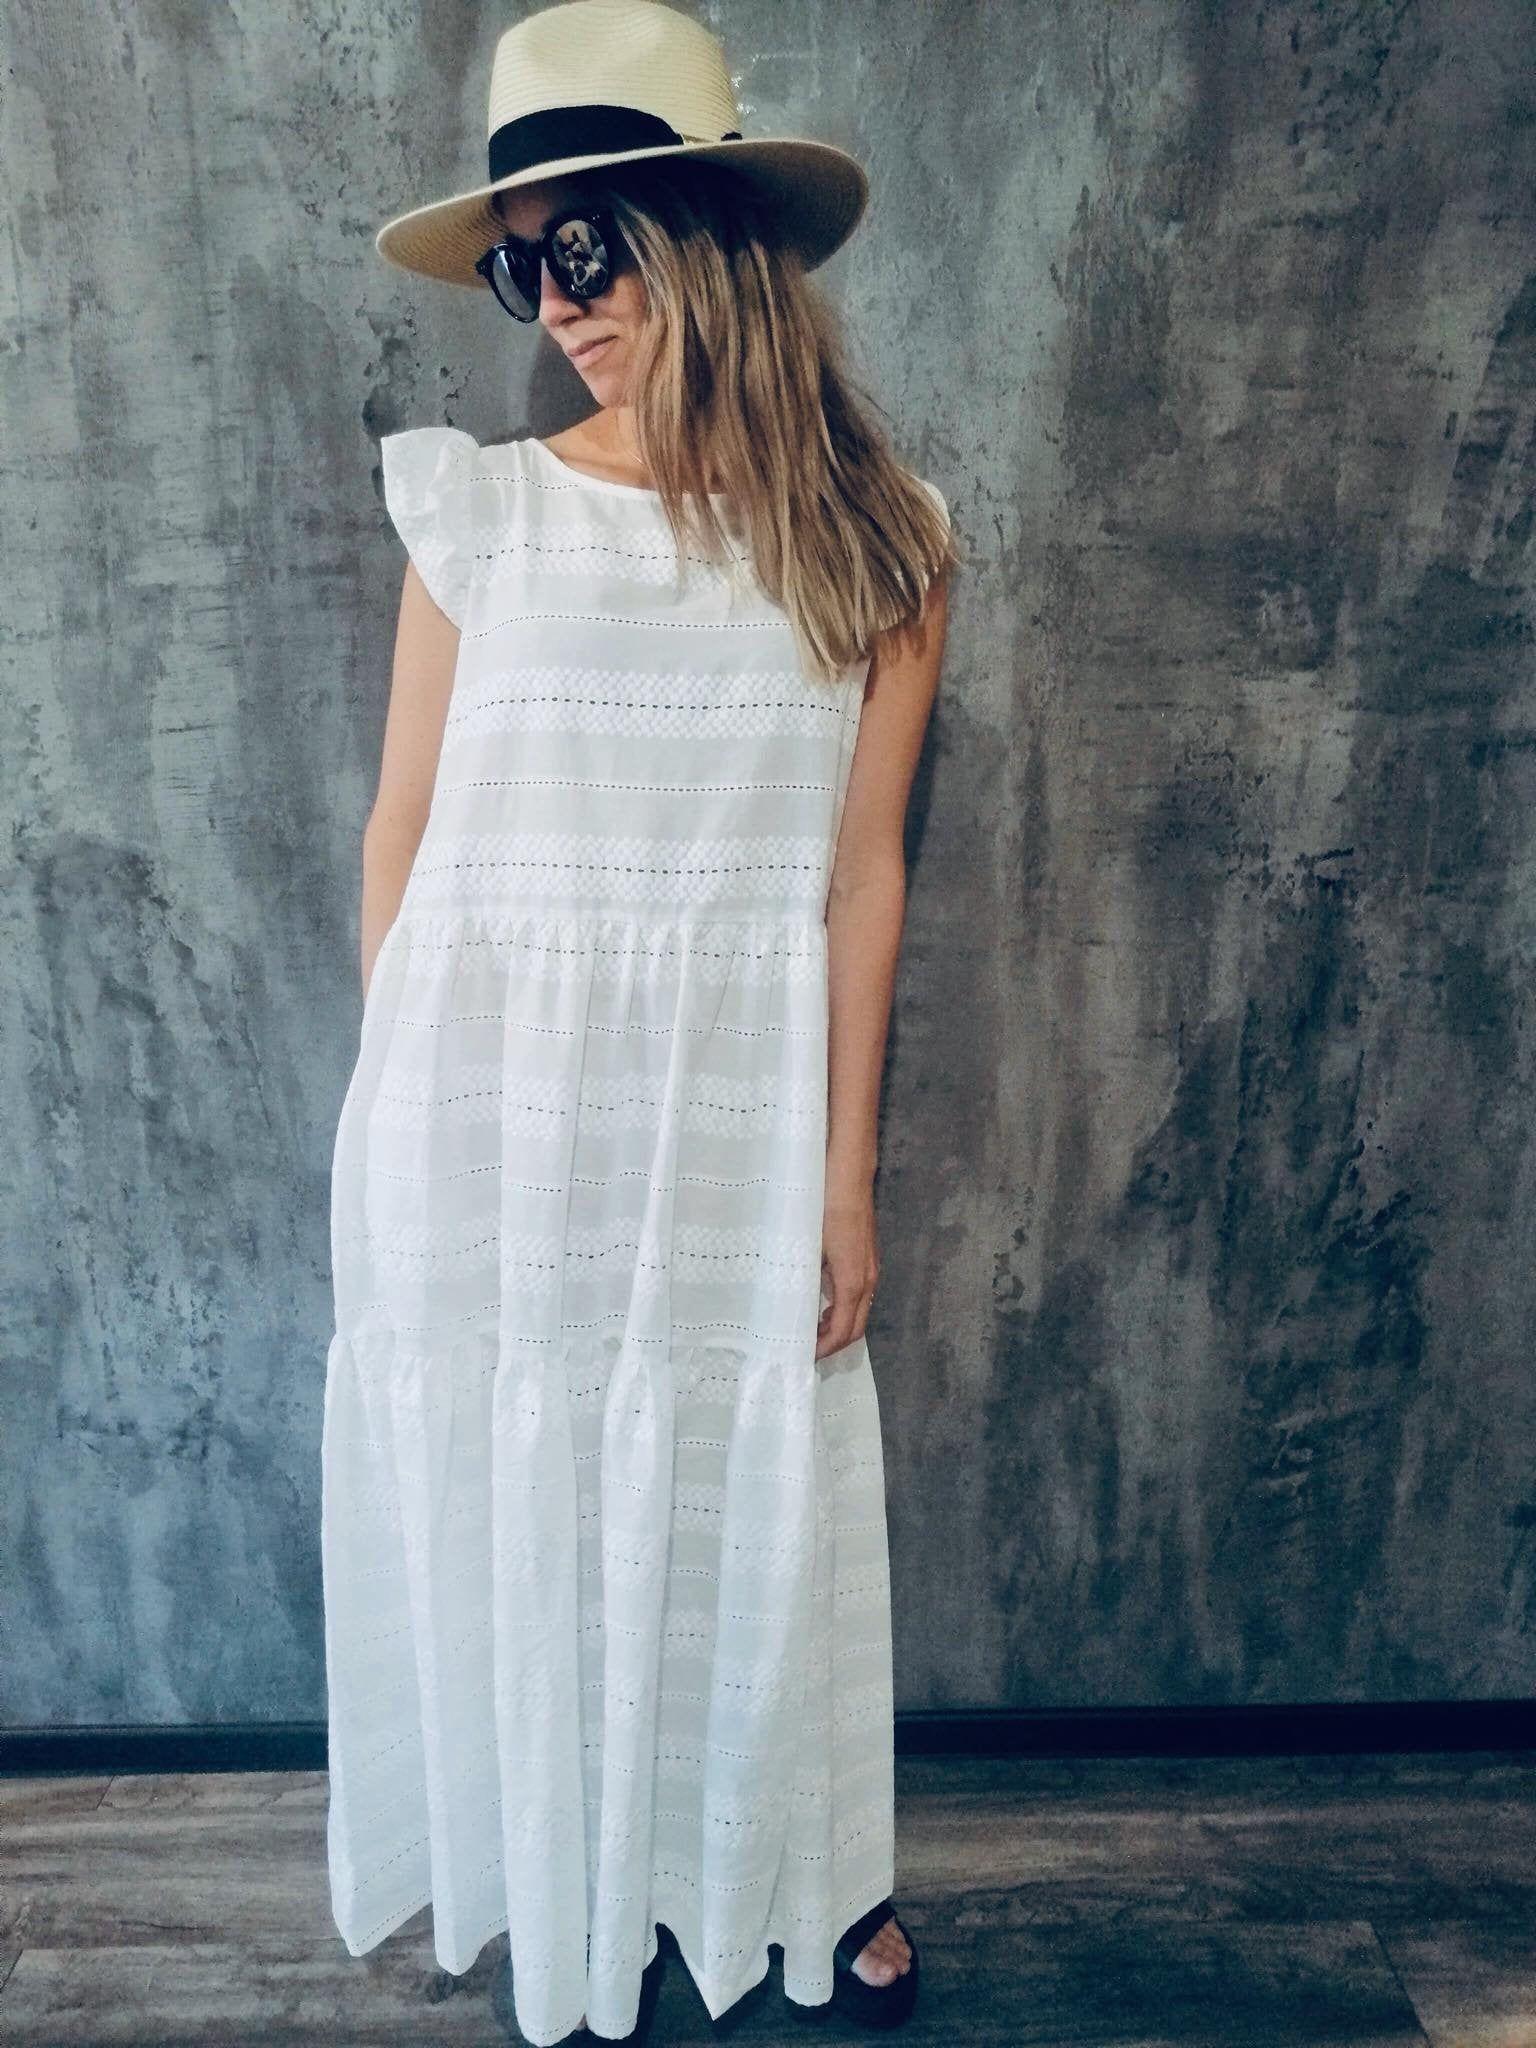 White Crochet Maxi Dress White Maxi Beach Dress White Maxi Summer Dress White Maxi Beach Dress Crochet Maxi Dress White Maxi Dresses [ 2048 x 1536 Pixel ]